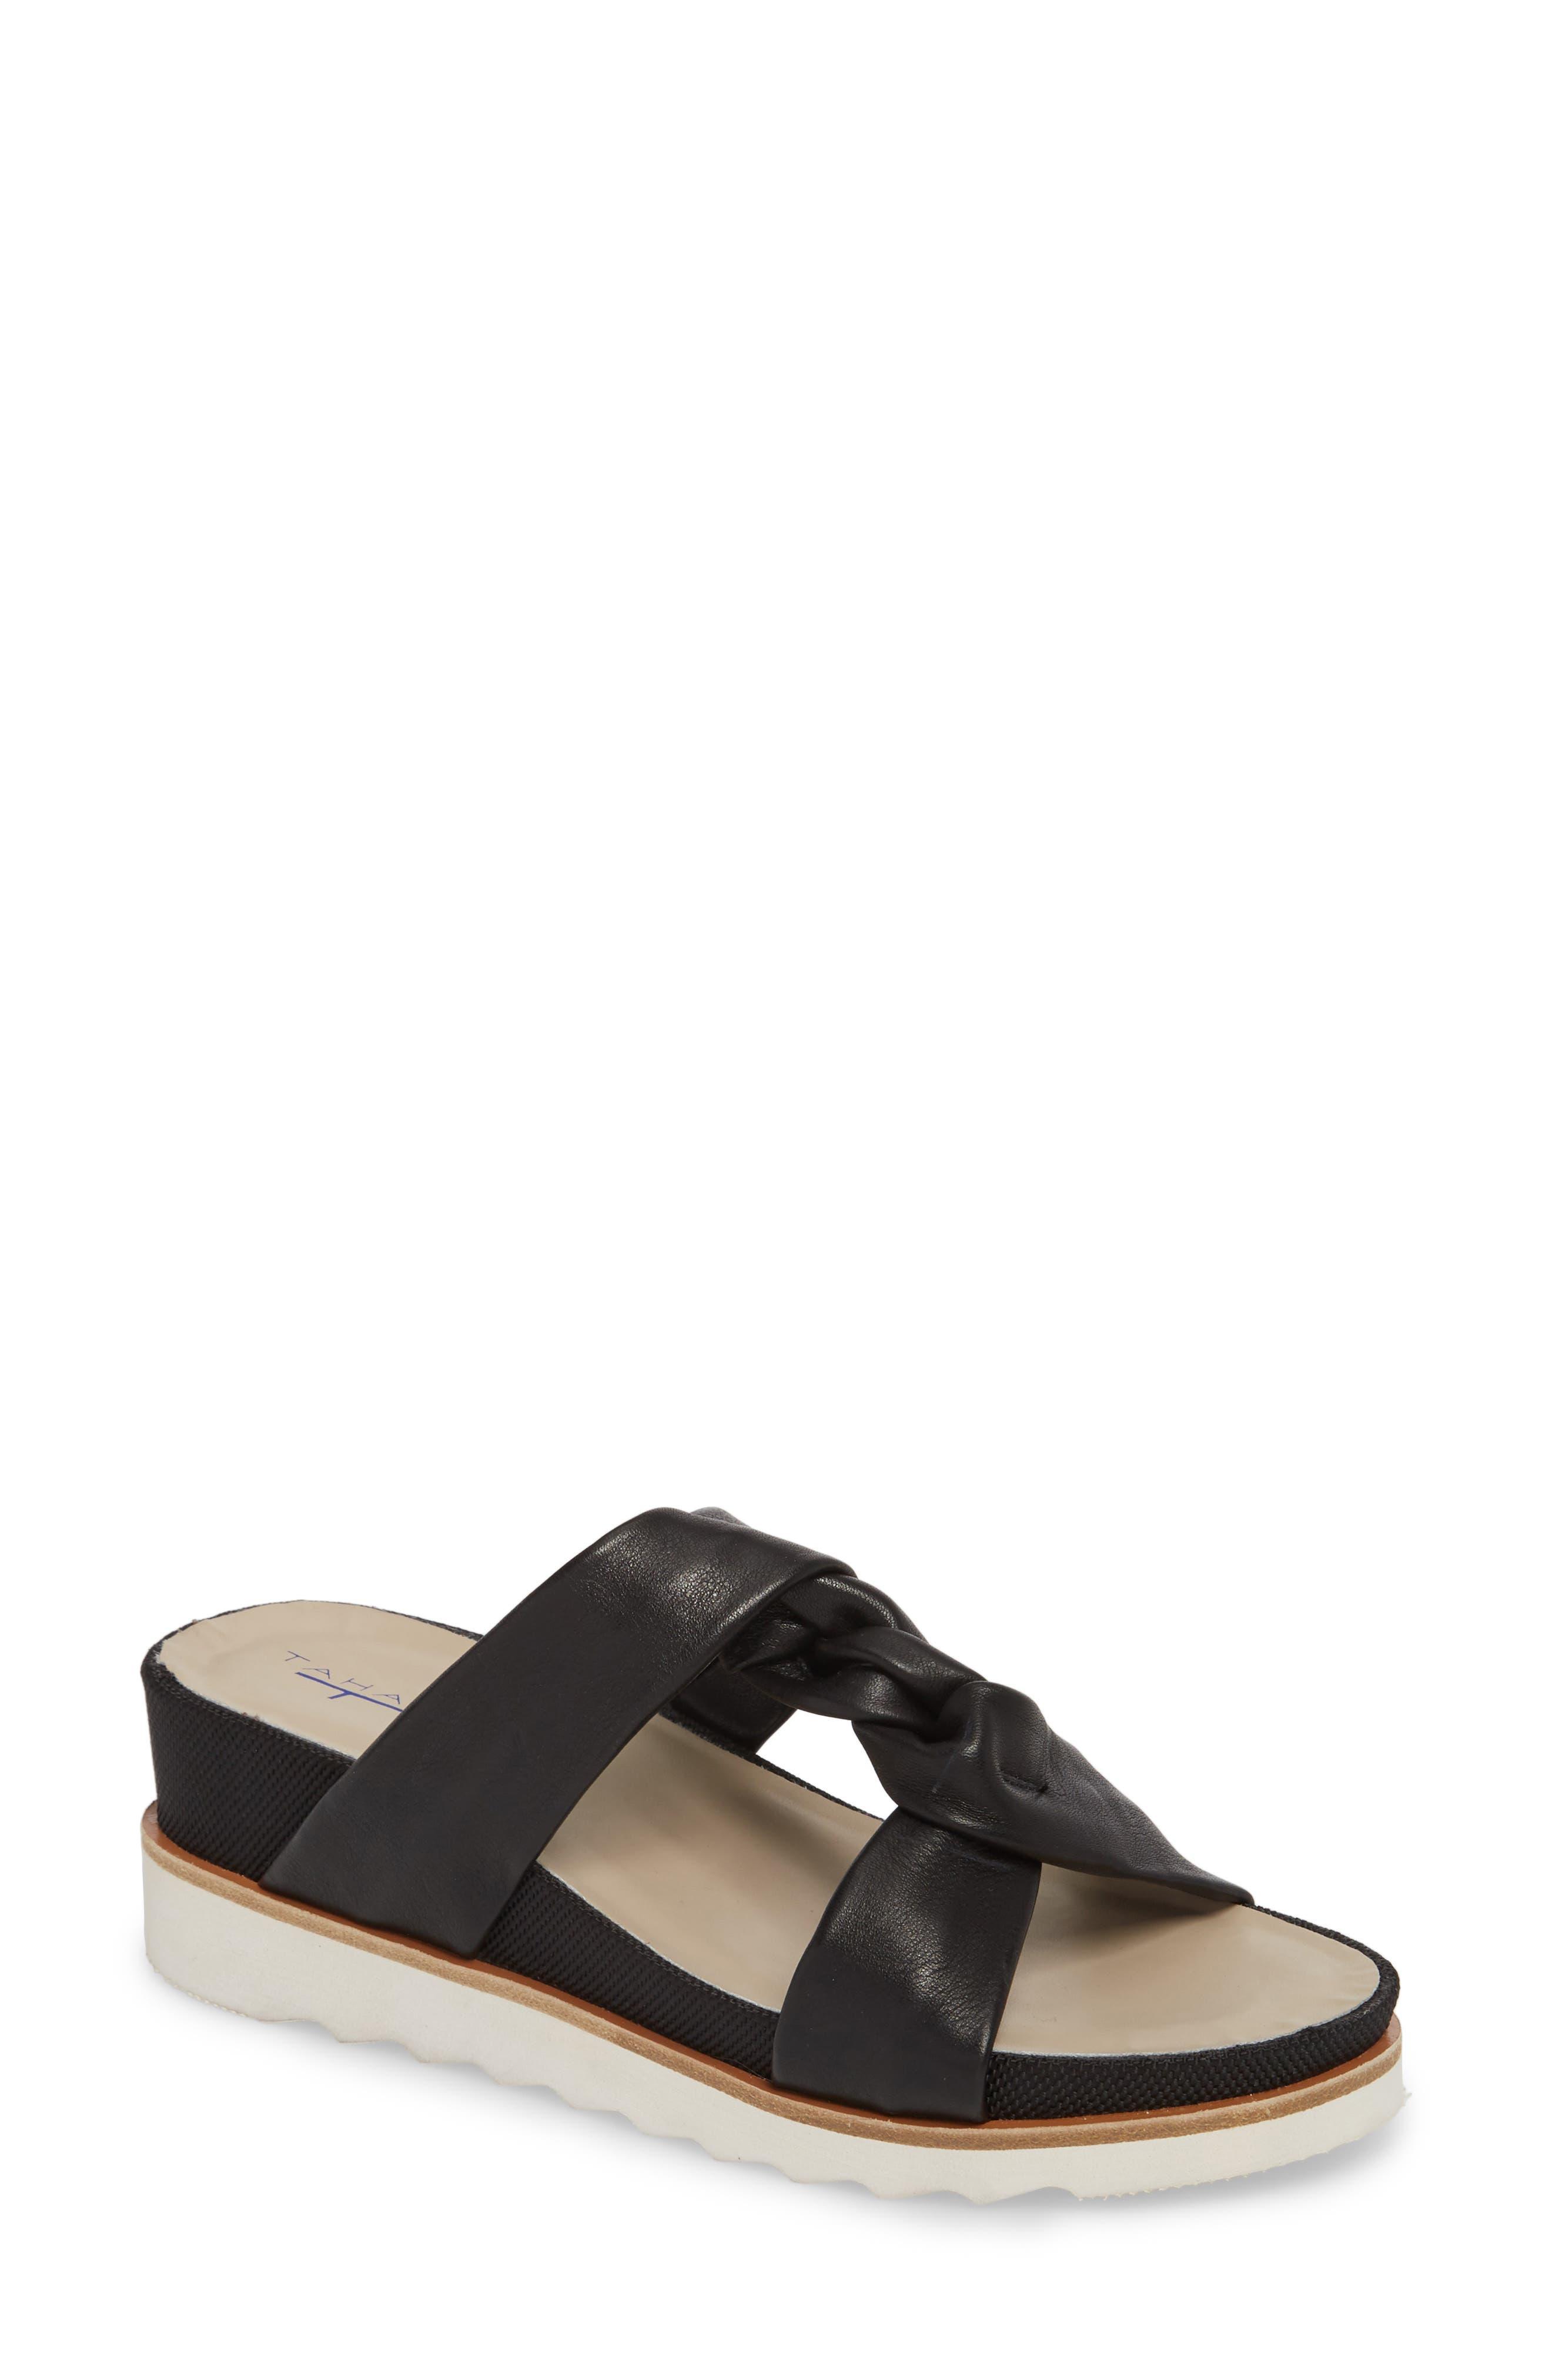 Ginger Slide Sandal,                             Main thumbnail 1, color,                             Black Leather